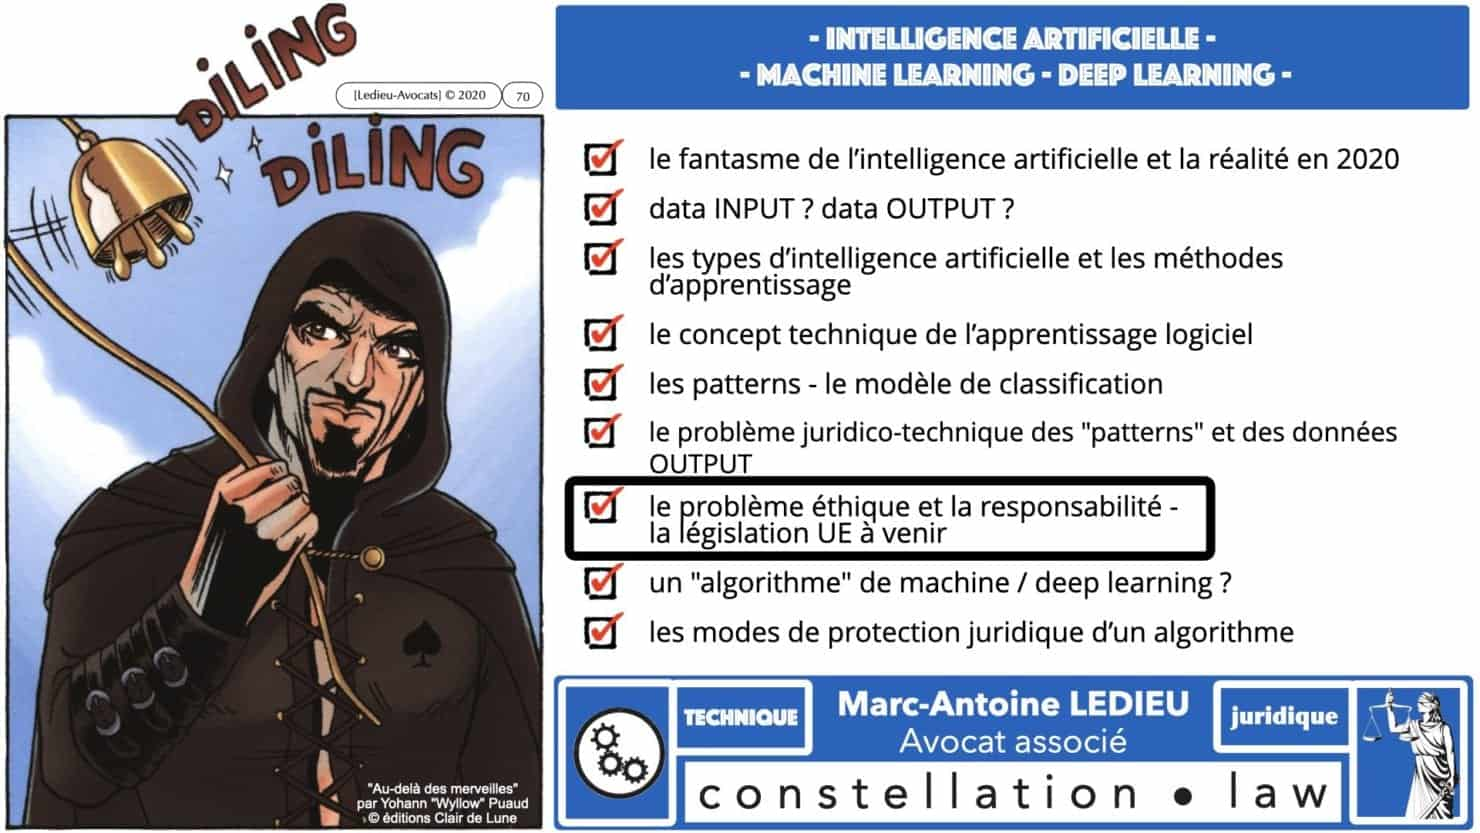 307 Intelligence artificielle-machine-learning-deep-learning-base de données-BIG-DATA *16:9* Constellation ©Ledieu-Avocat-13-10-2020.070